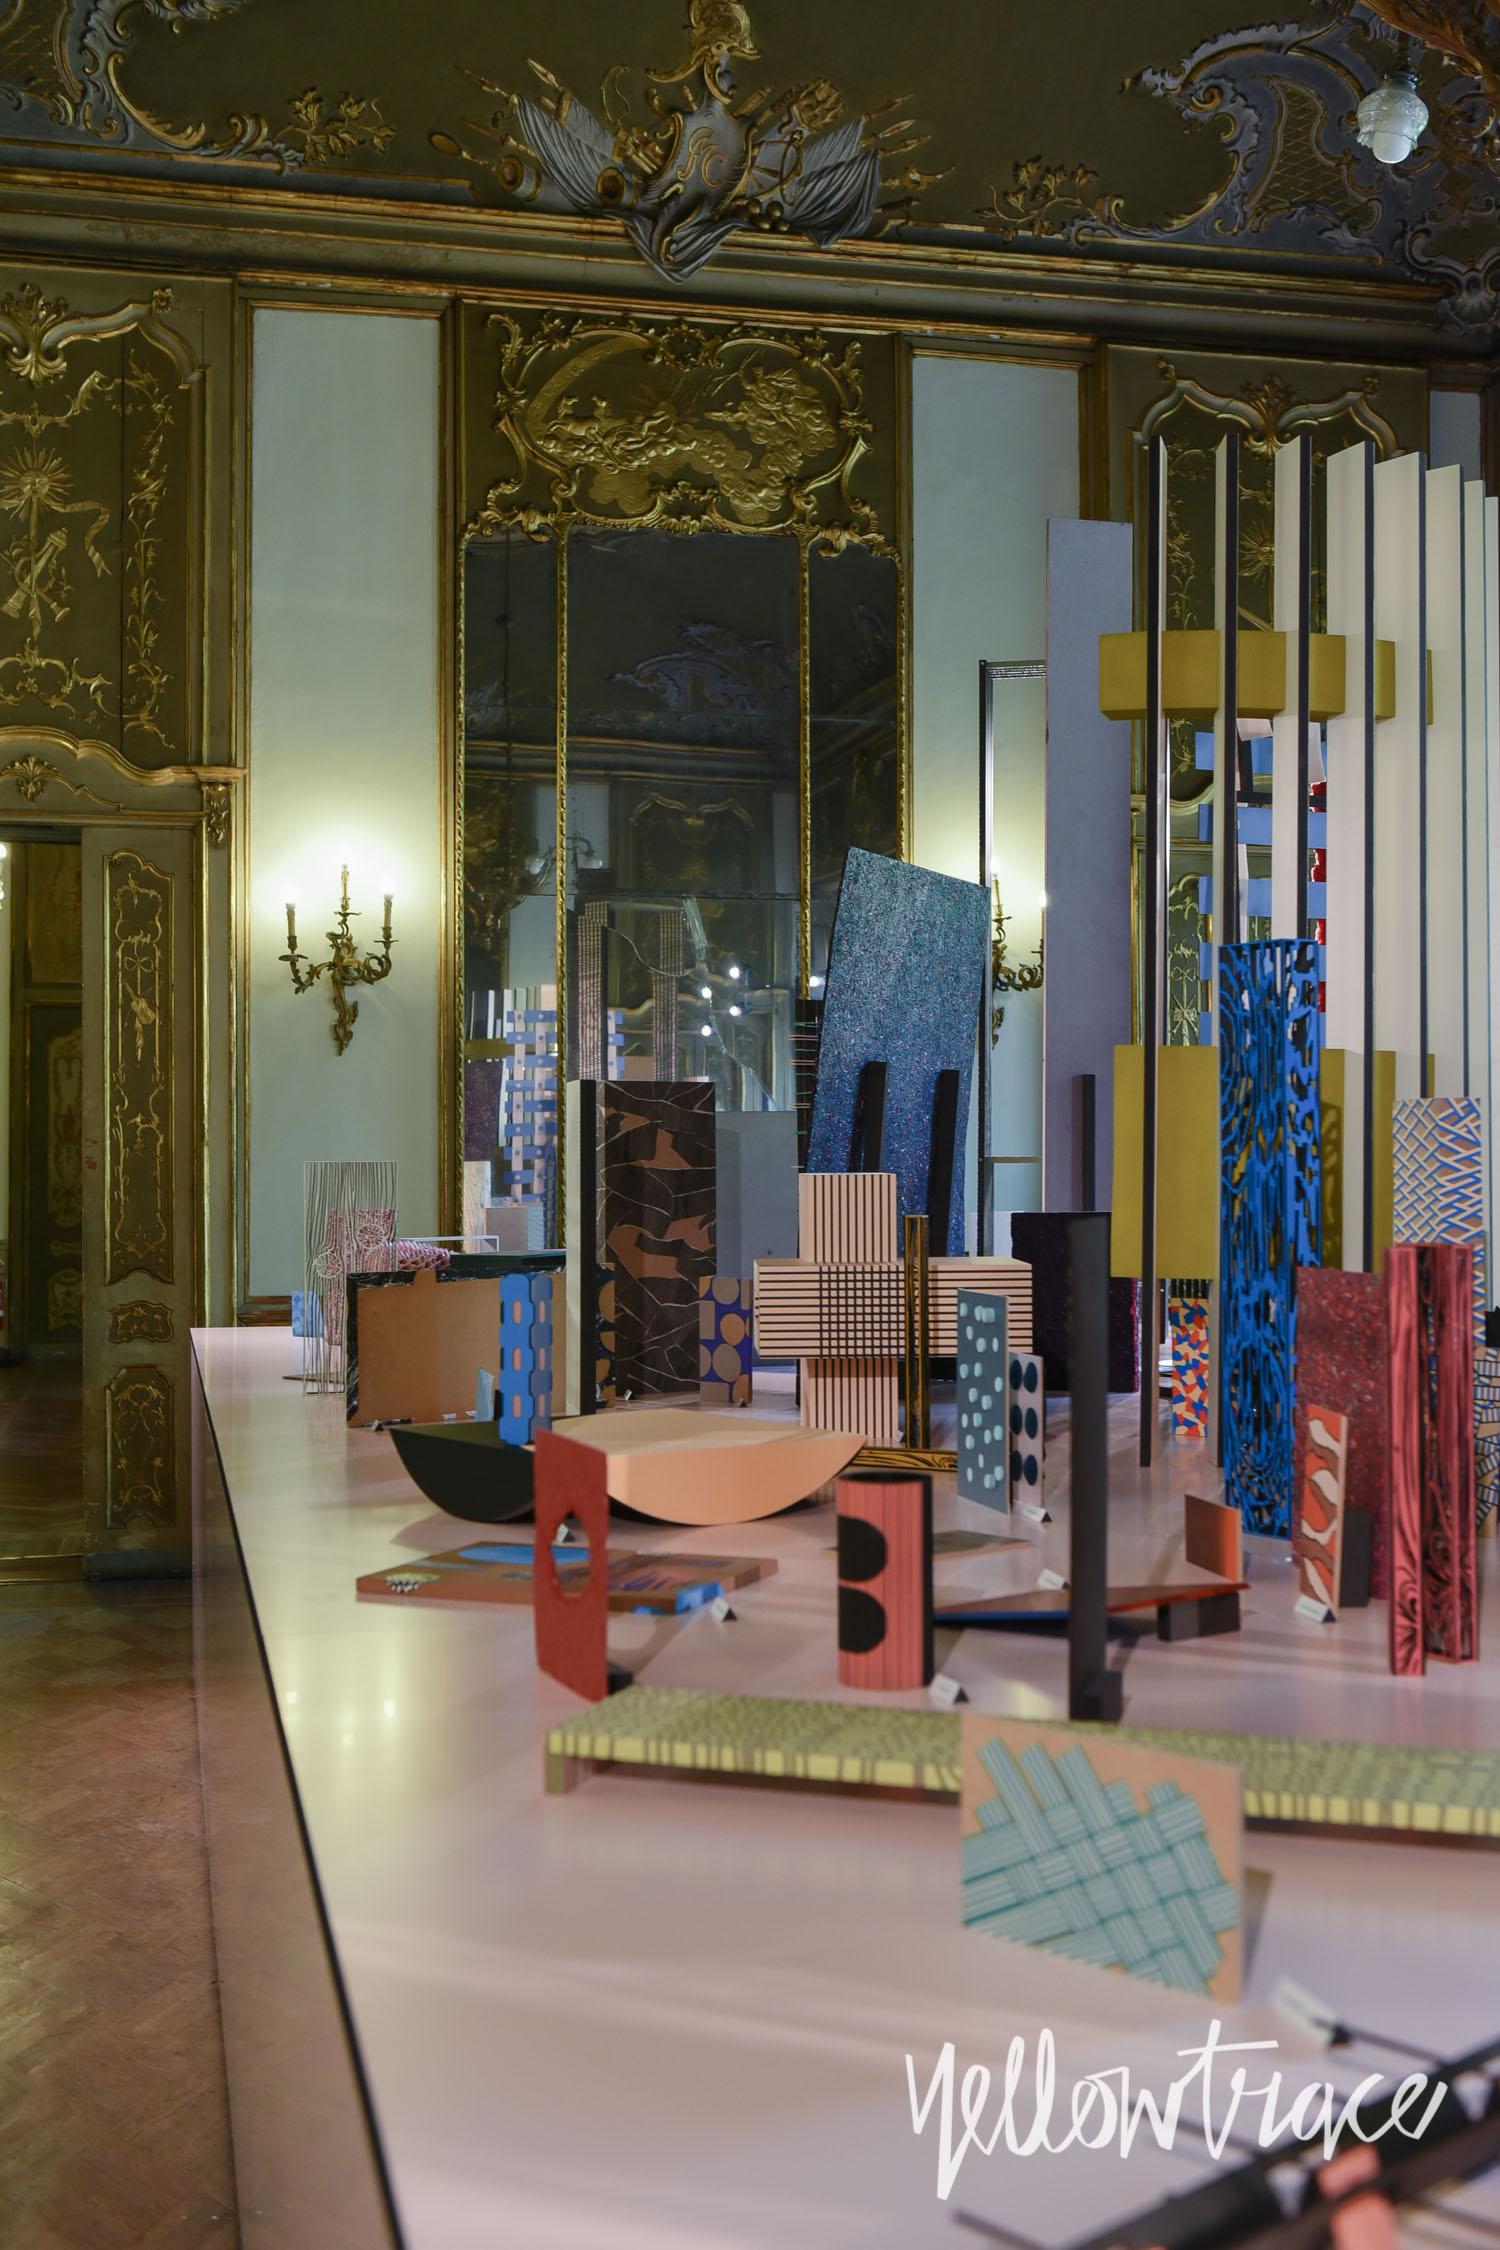 Milan Design Week 2017 Highlights, Envisions at Palazzo Clerici, Photo © Nick Hughes | #Milantrace2017